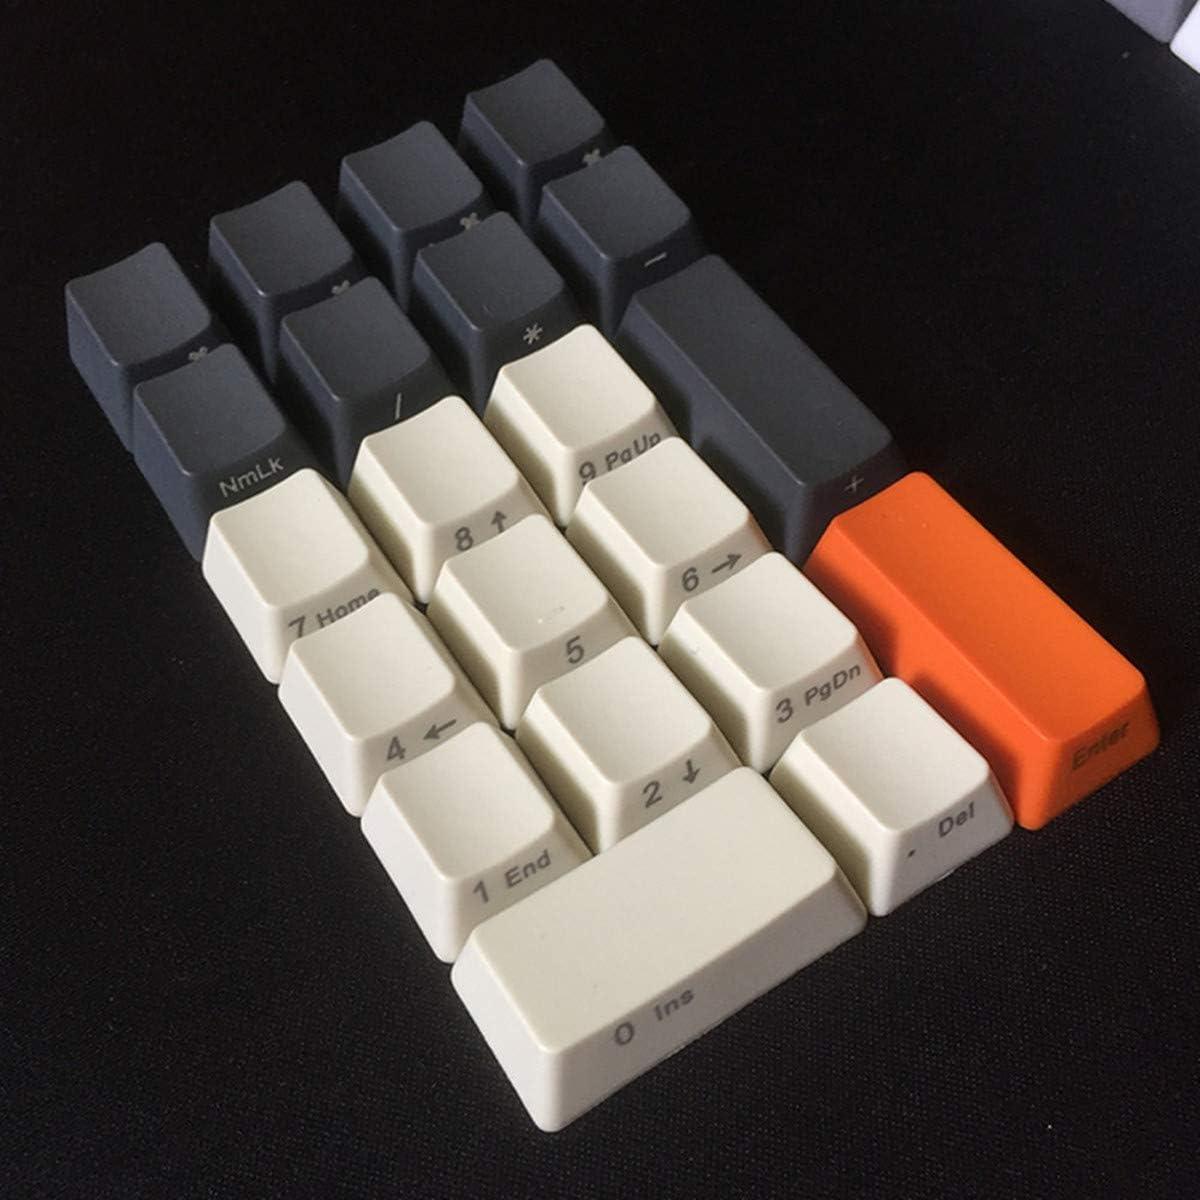 most preferential 20 Keys Numeric Keypad PBT Dyeing Sublimation ...